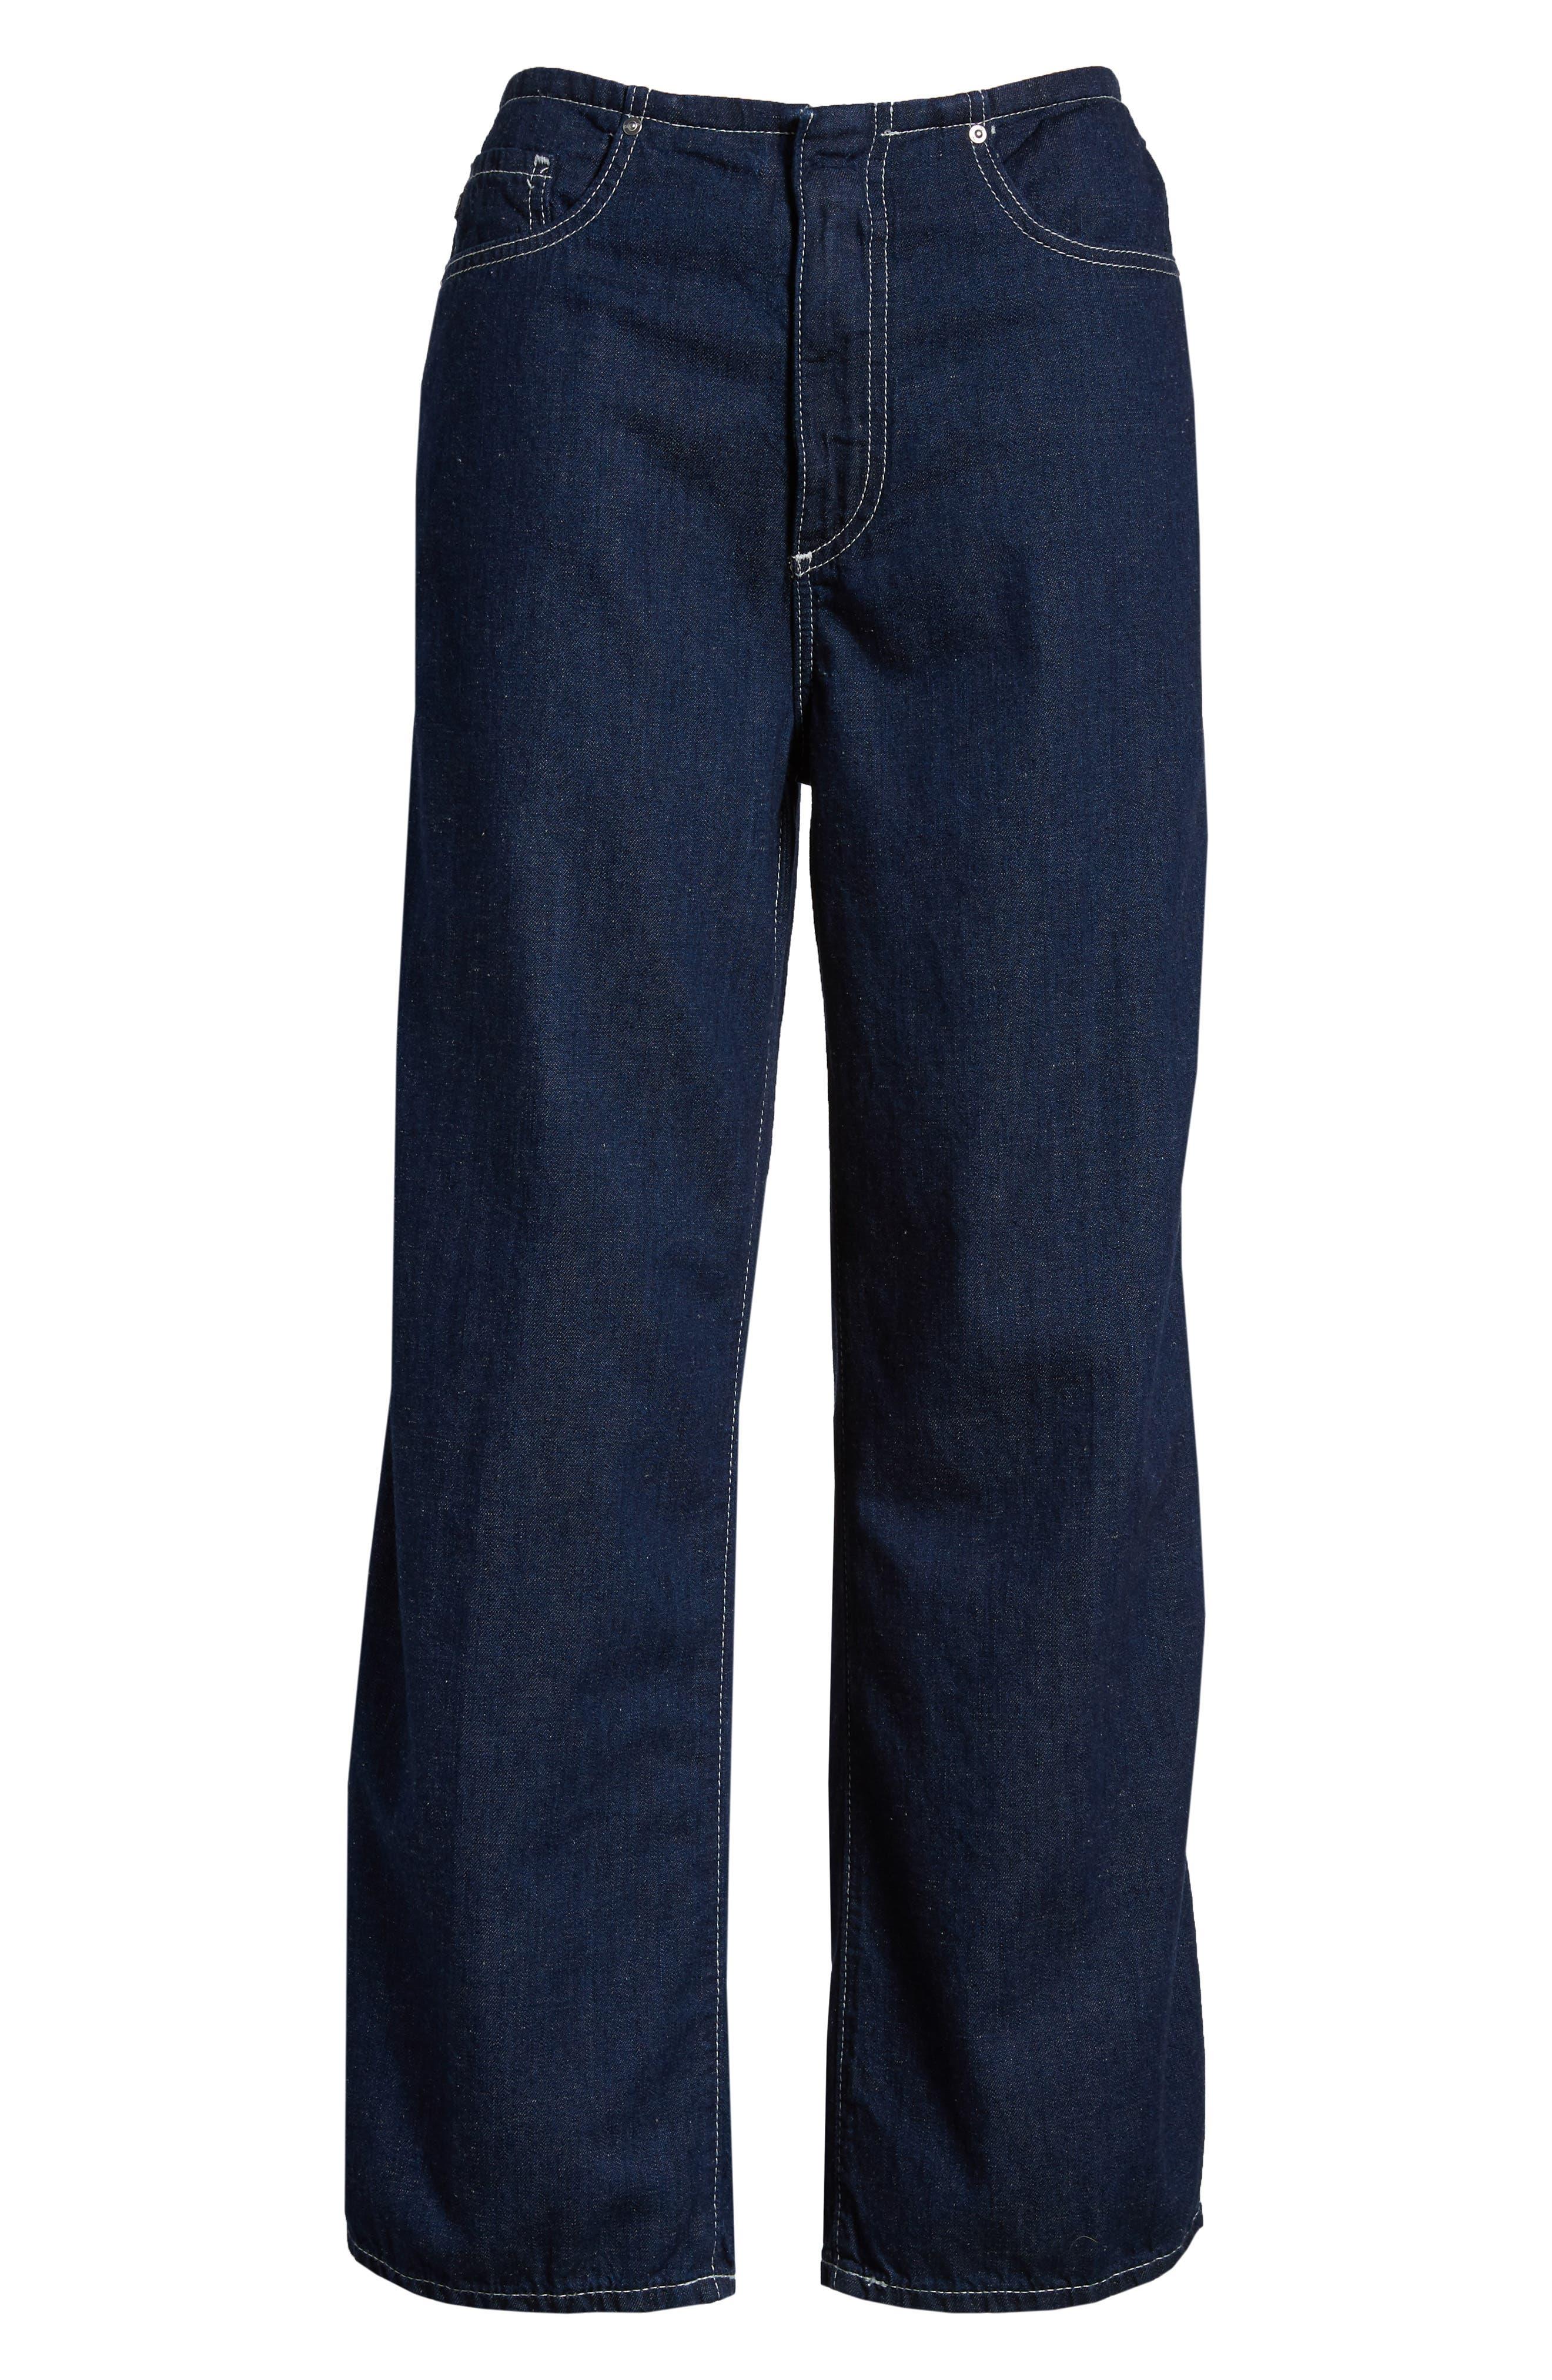 Etta High Waist Crop Wide Leg Jeans,                             Alternate thumbnail 6, color,                             496